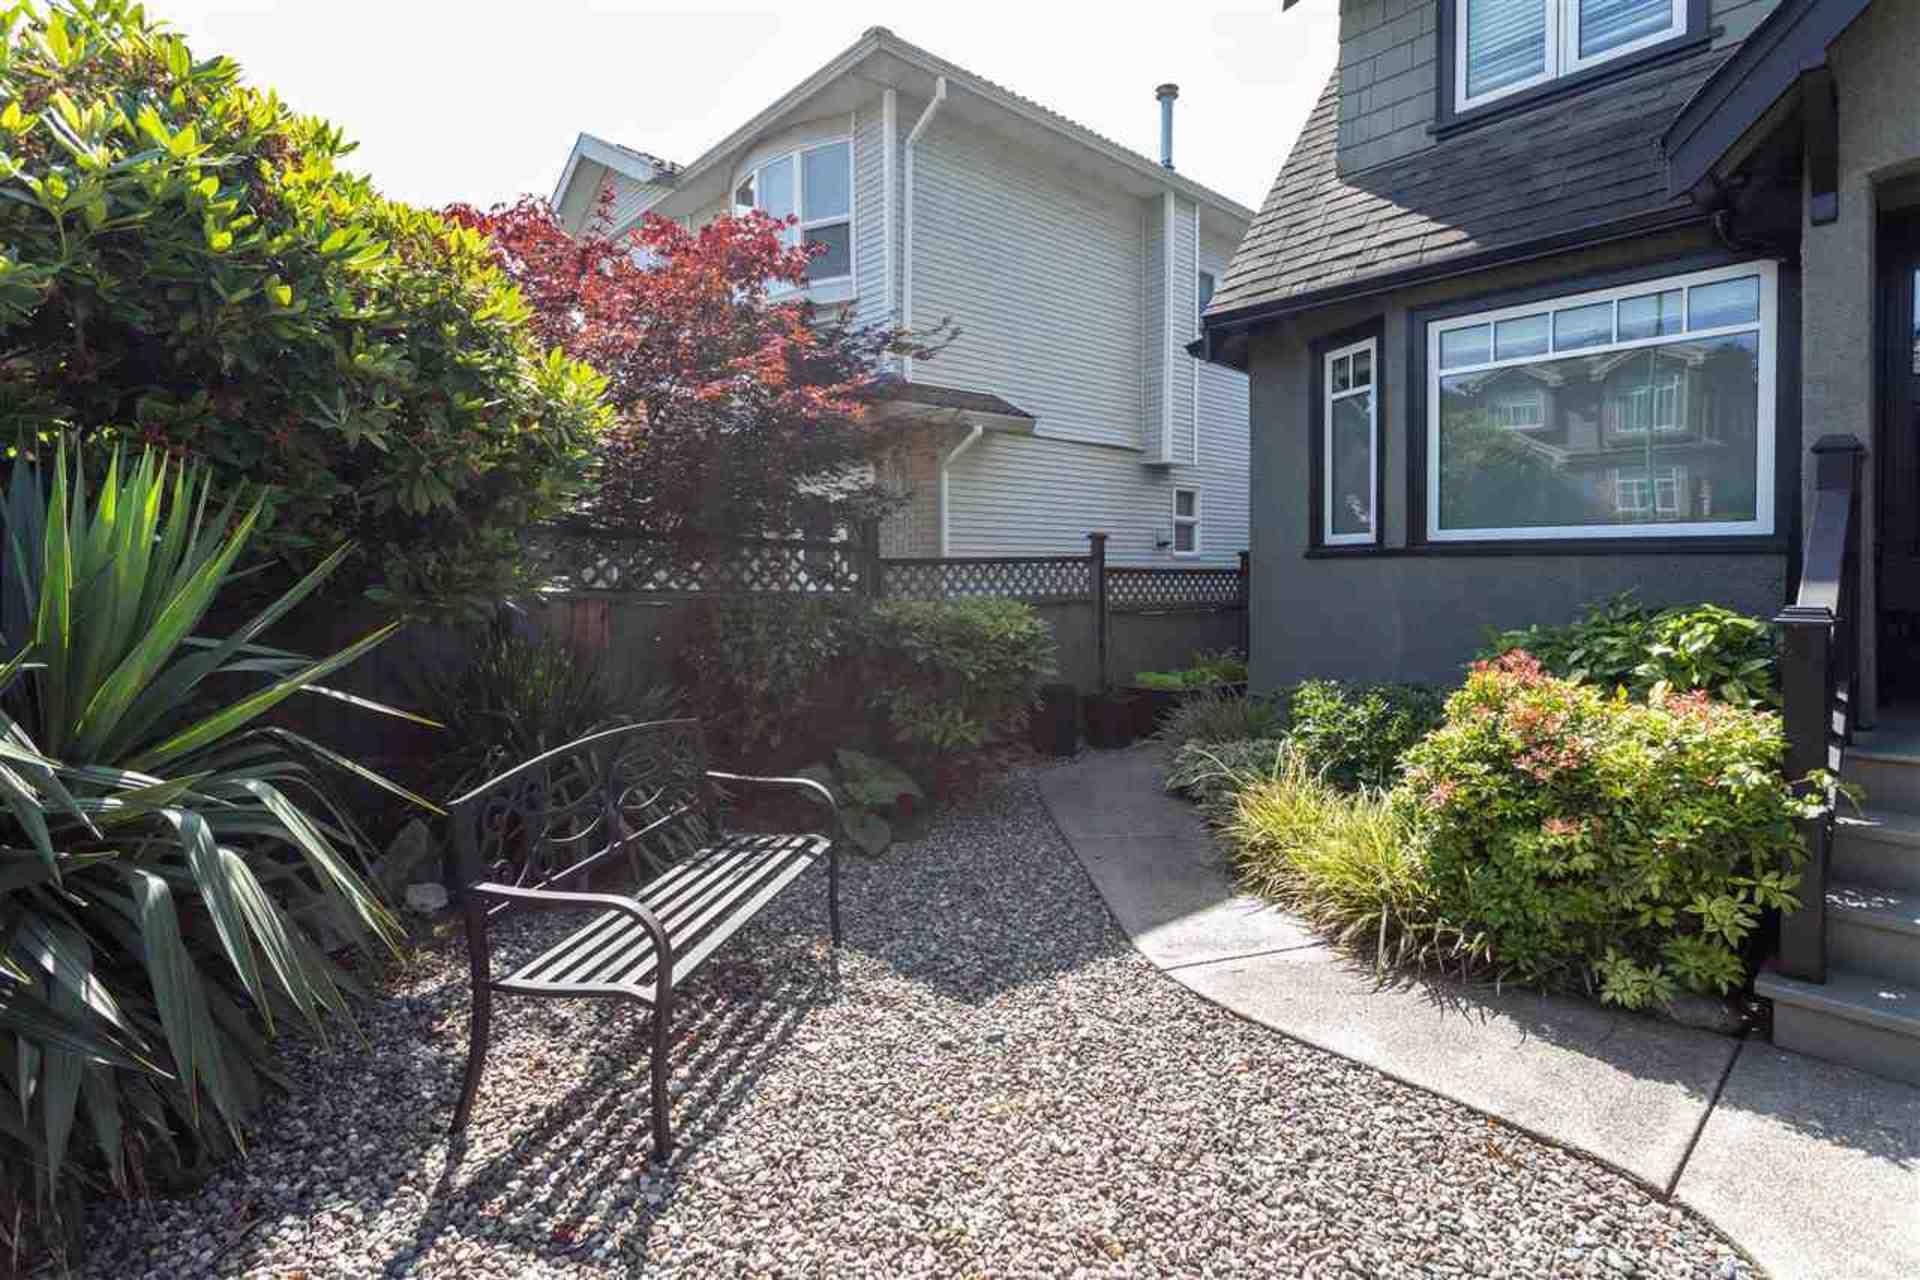 3912-parker-street-willingdon-heights-burnaby-north-04 at 3912 Parker Street, Willingdon Heights, Burnaby North